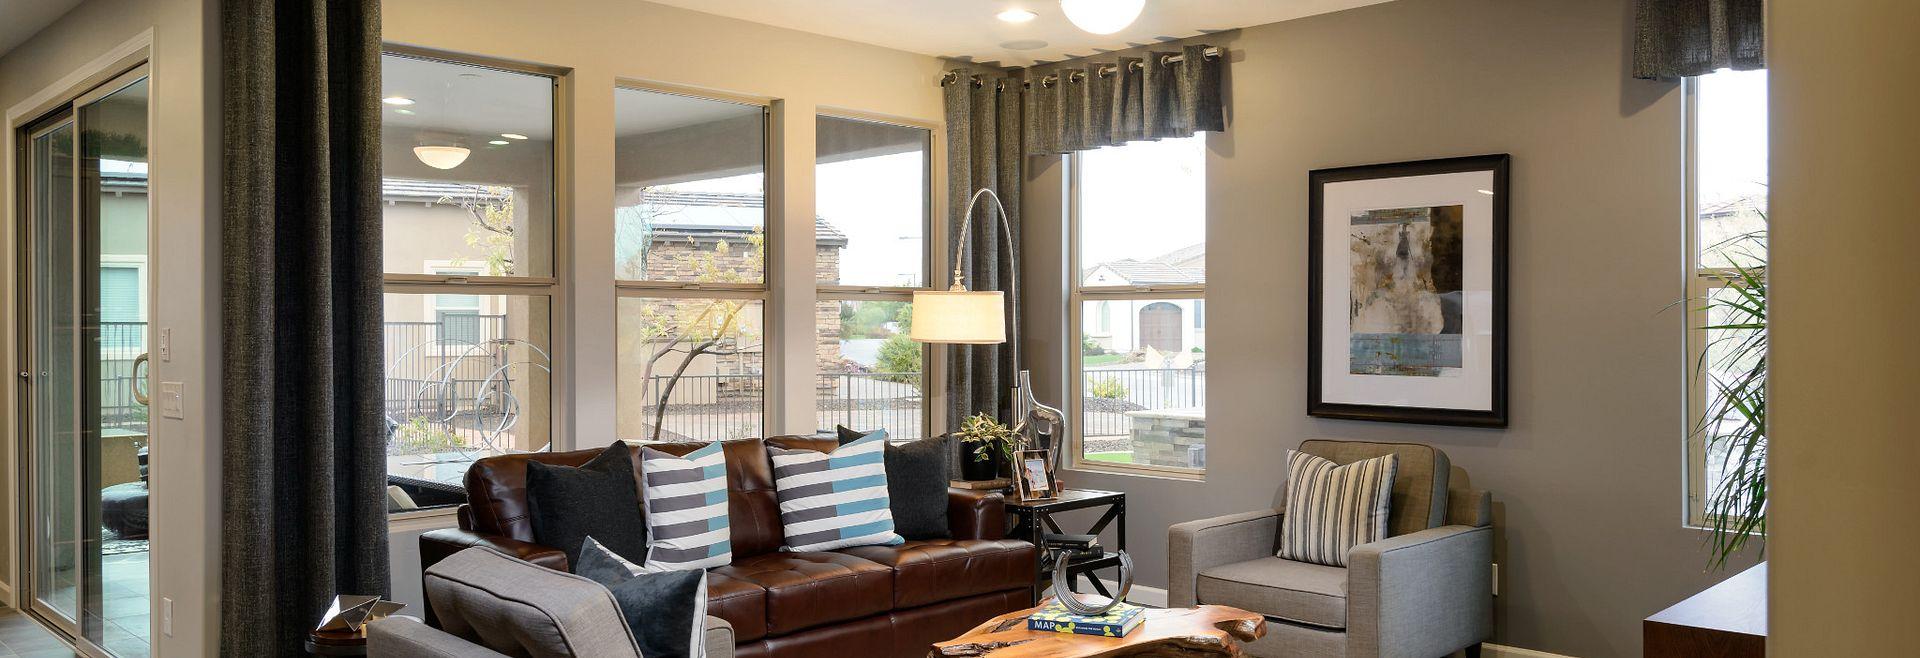 Optic Model Living Room